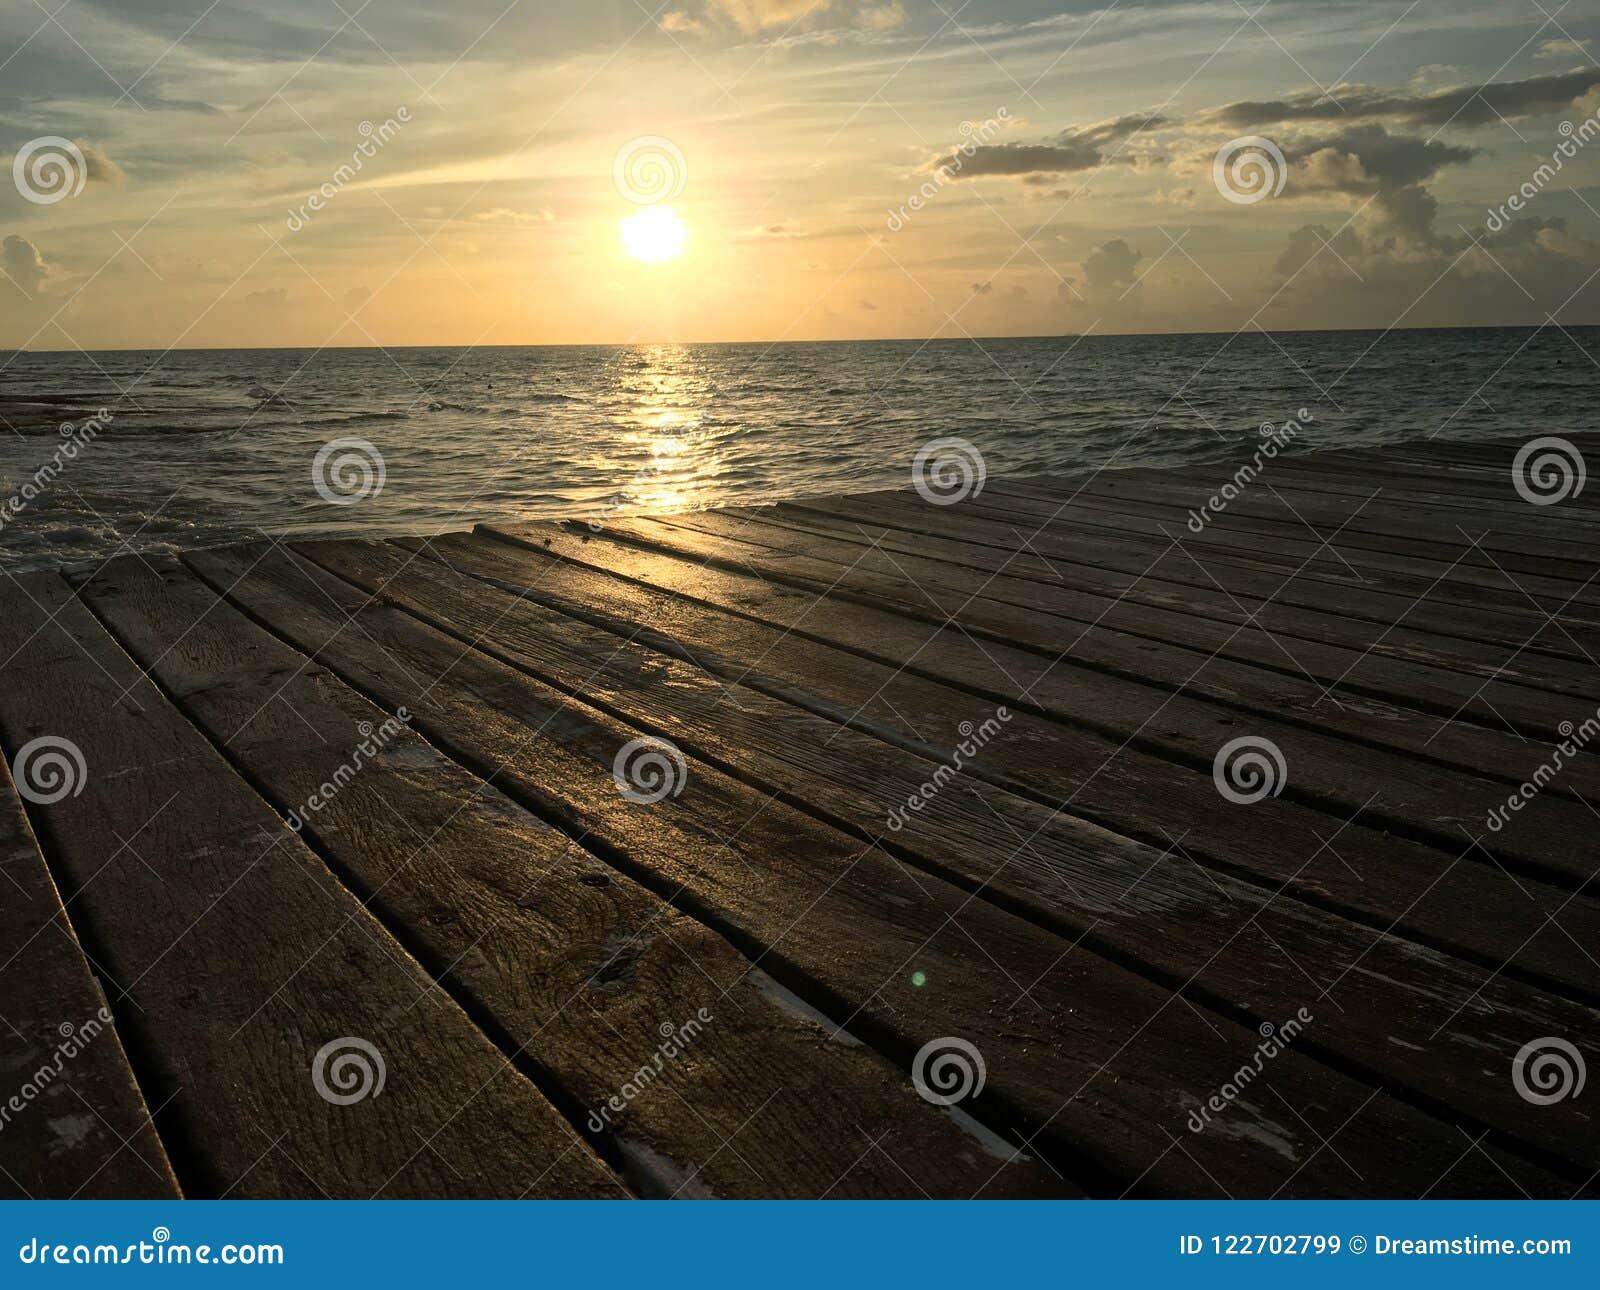 SonnenaufgangMeerwasser-Dockholz